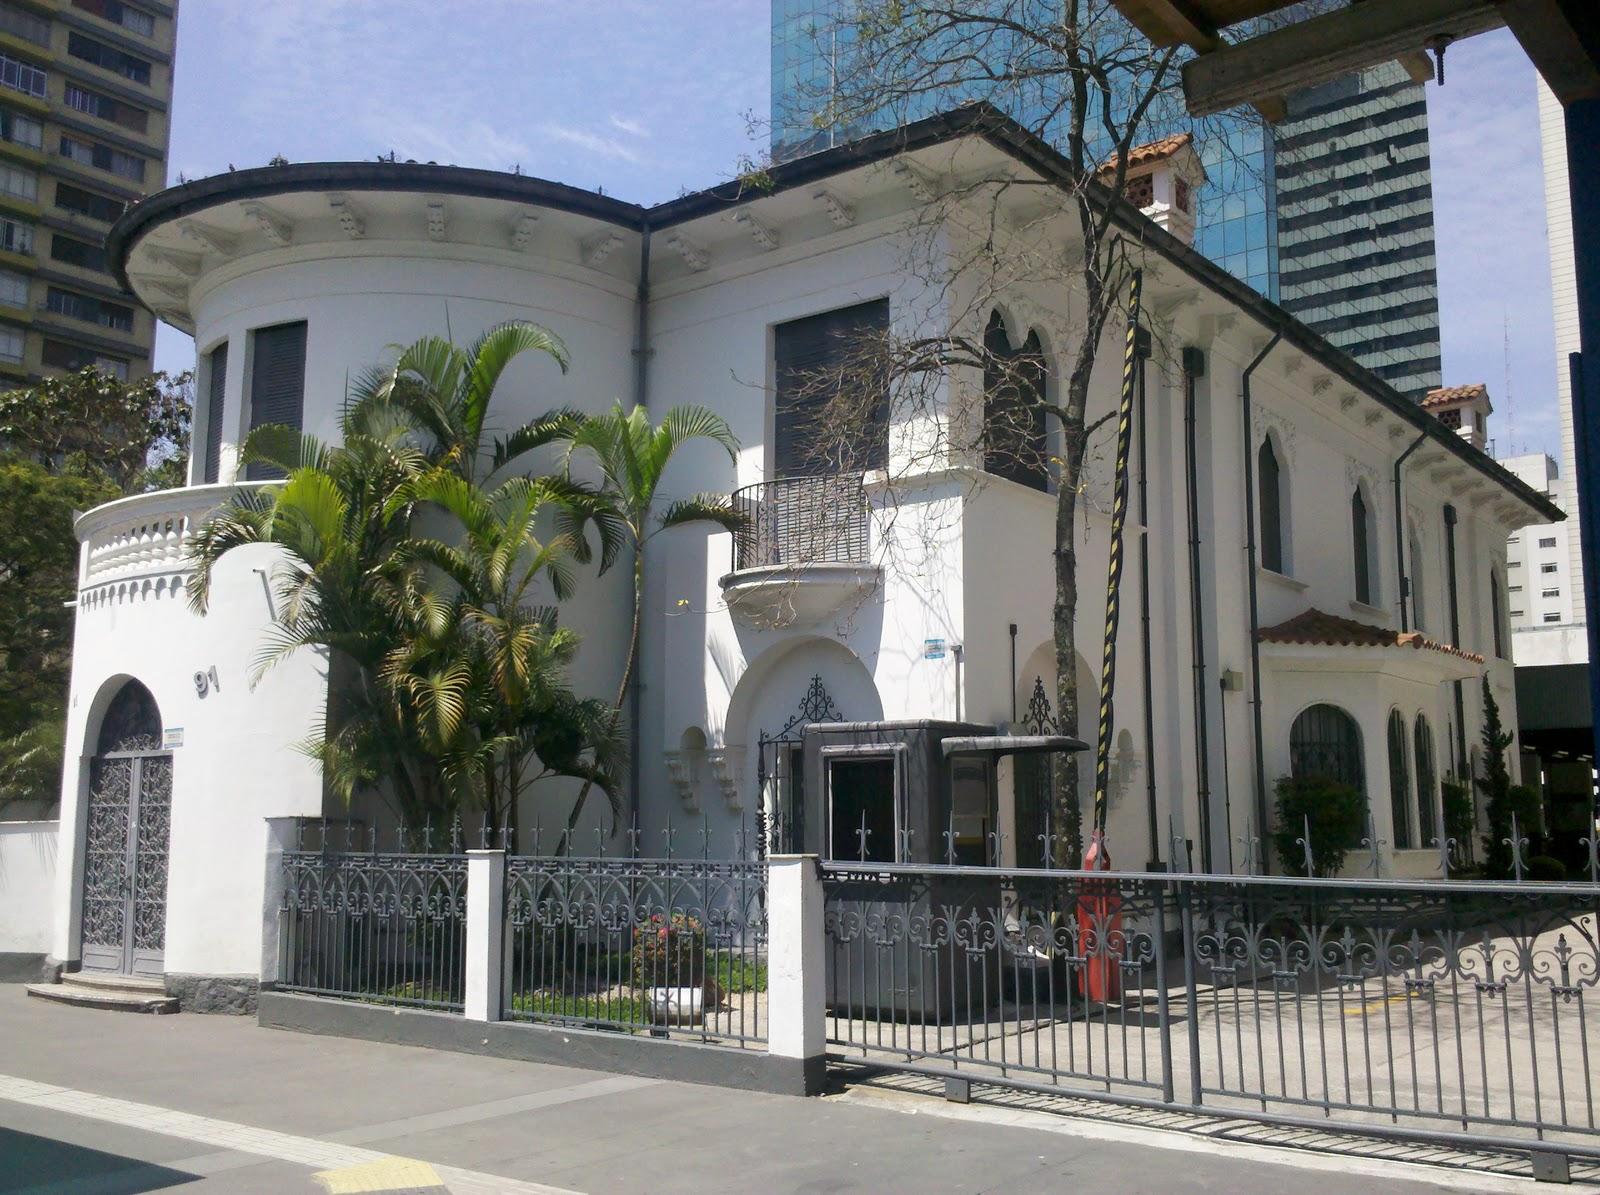 2011 10 22 11 24 55 597 - Série Avenida Paulista: mistério do palacete - os Brandi, os Lenci e a Even.